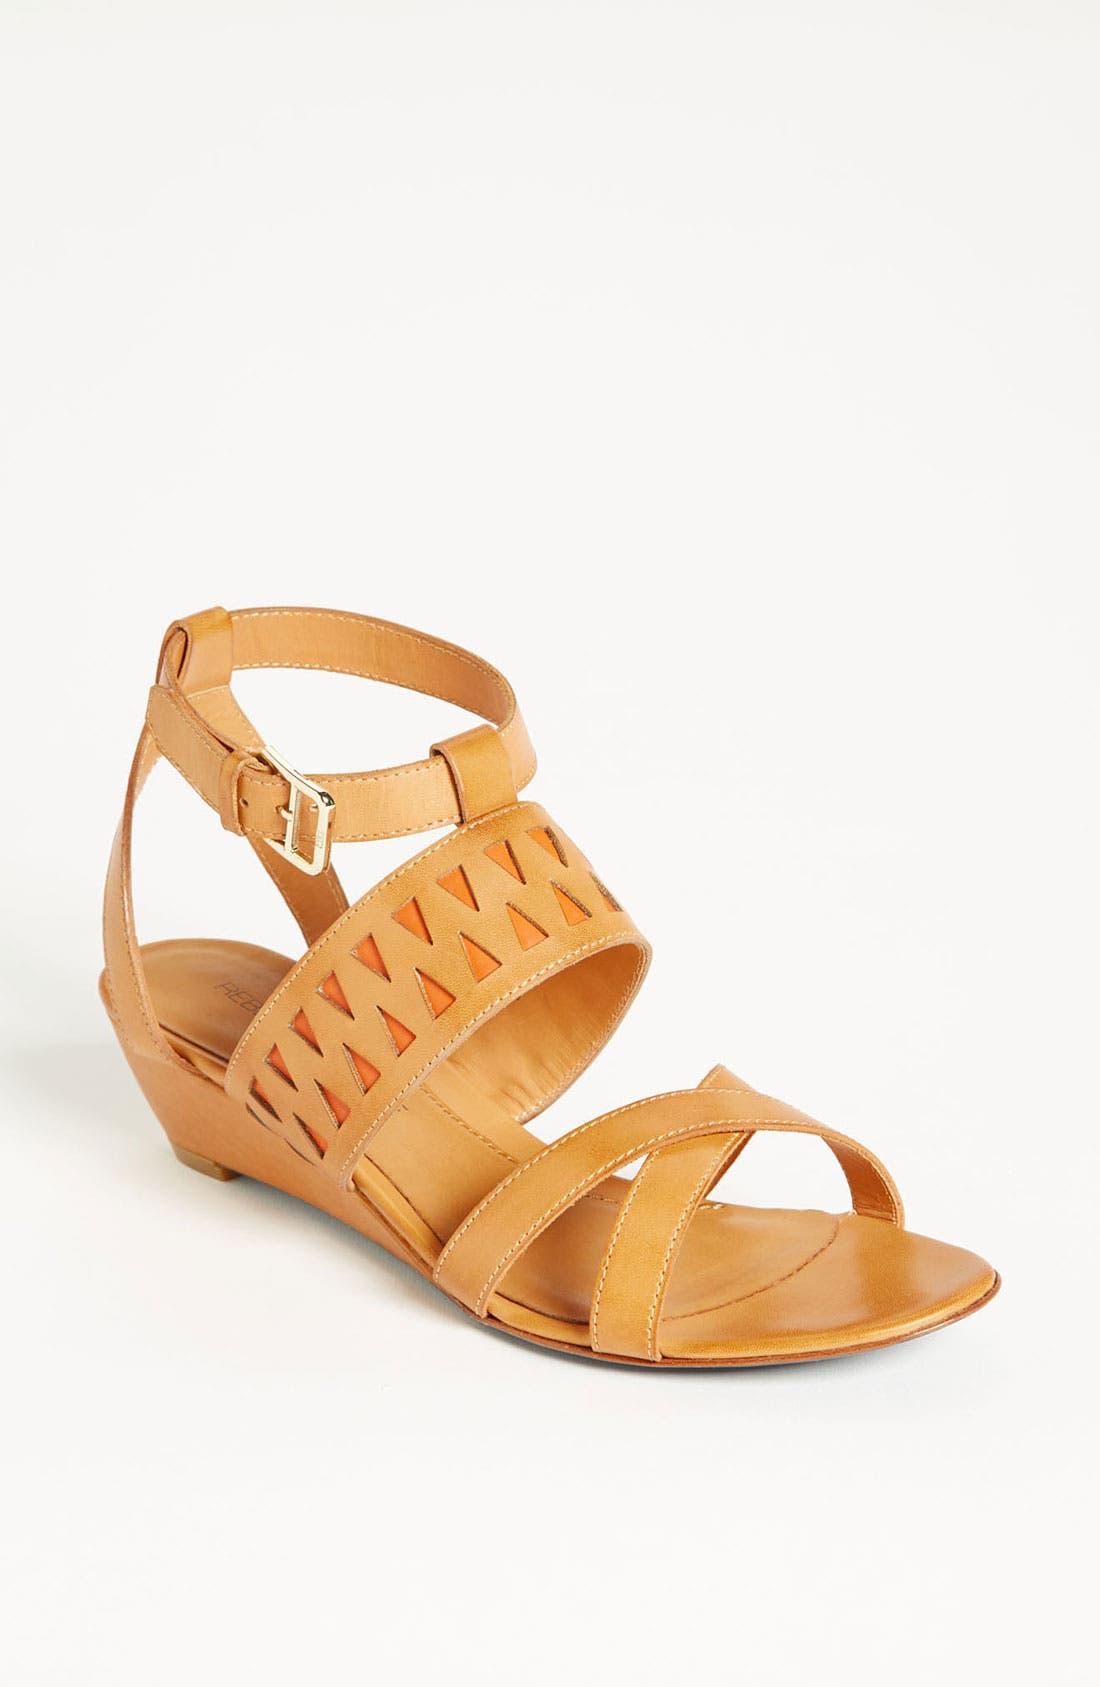 Alternate Image 1 Selected - Rebecca Minkoff 'Lupe' Sandal